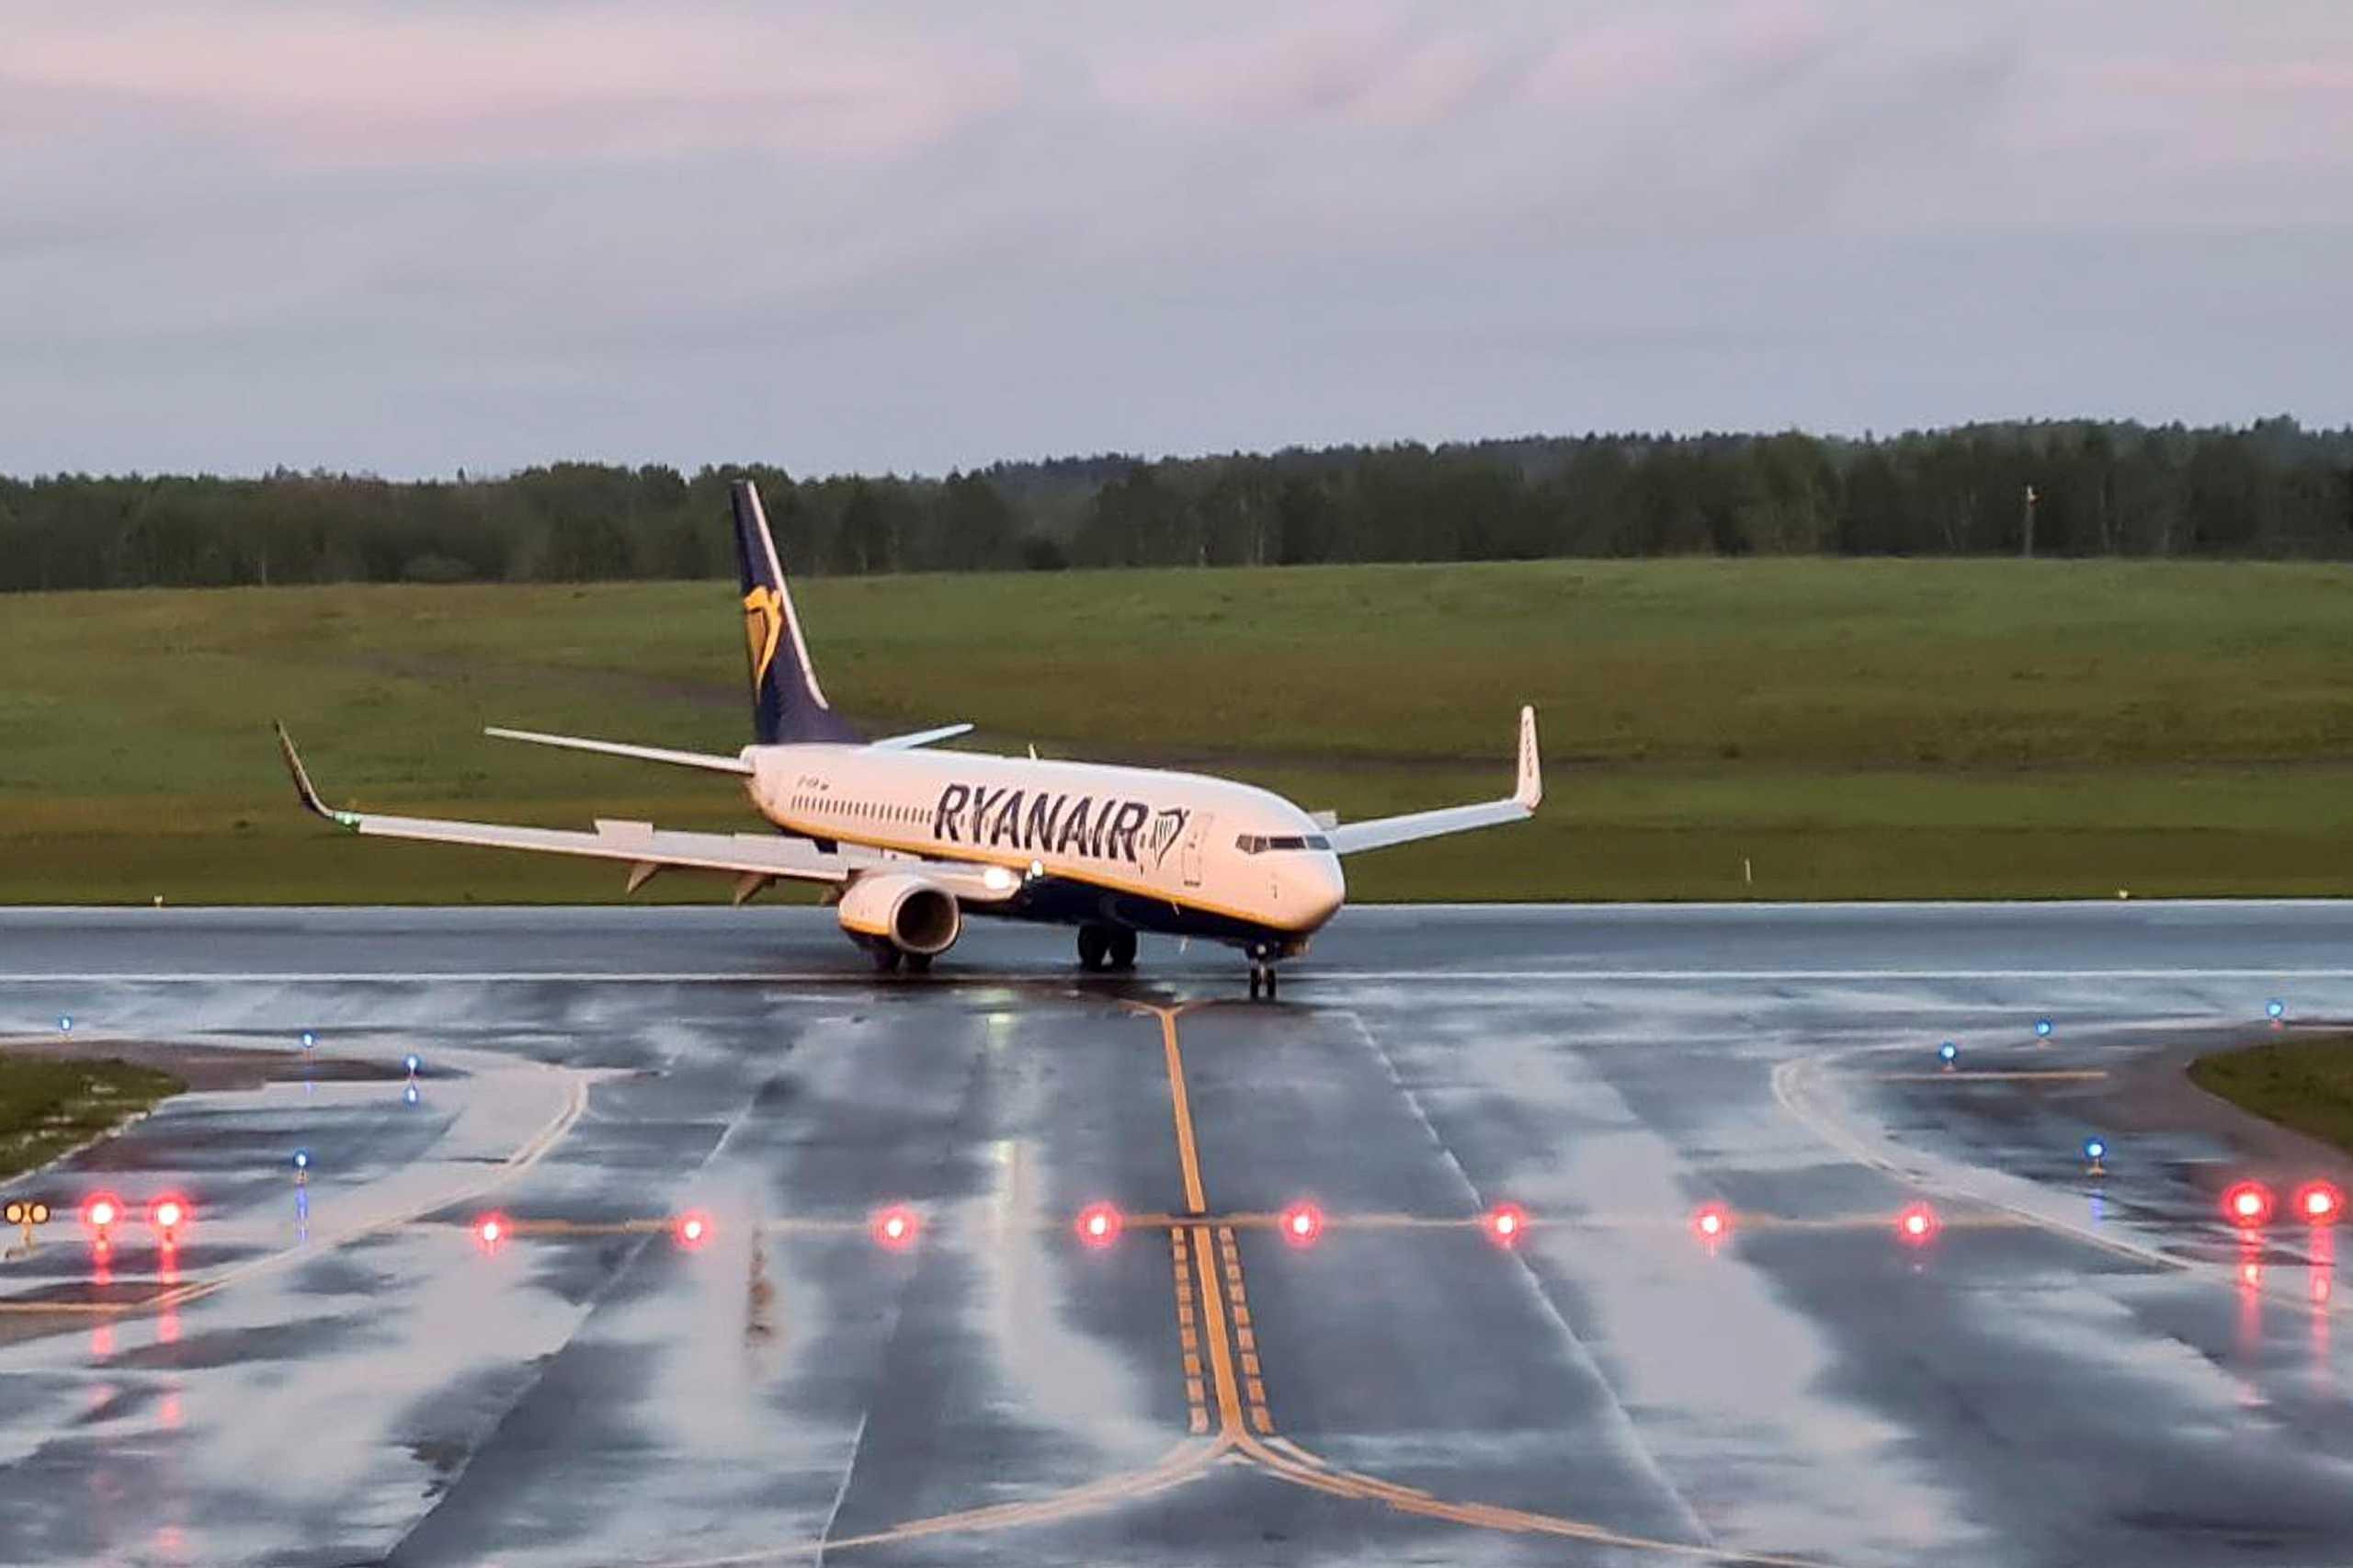 Ryanair: Έρευνες της ΕΥΠ για πράκτορες στην πτήση του Προτάσεβιτς (video)